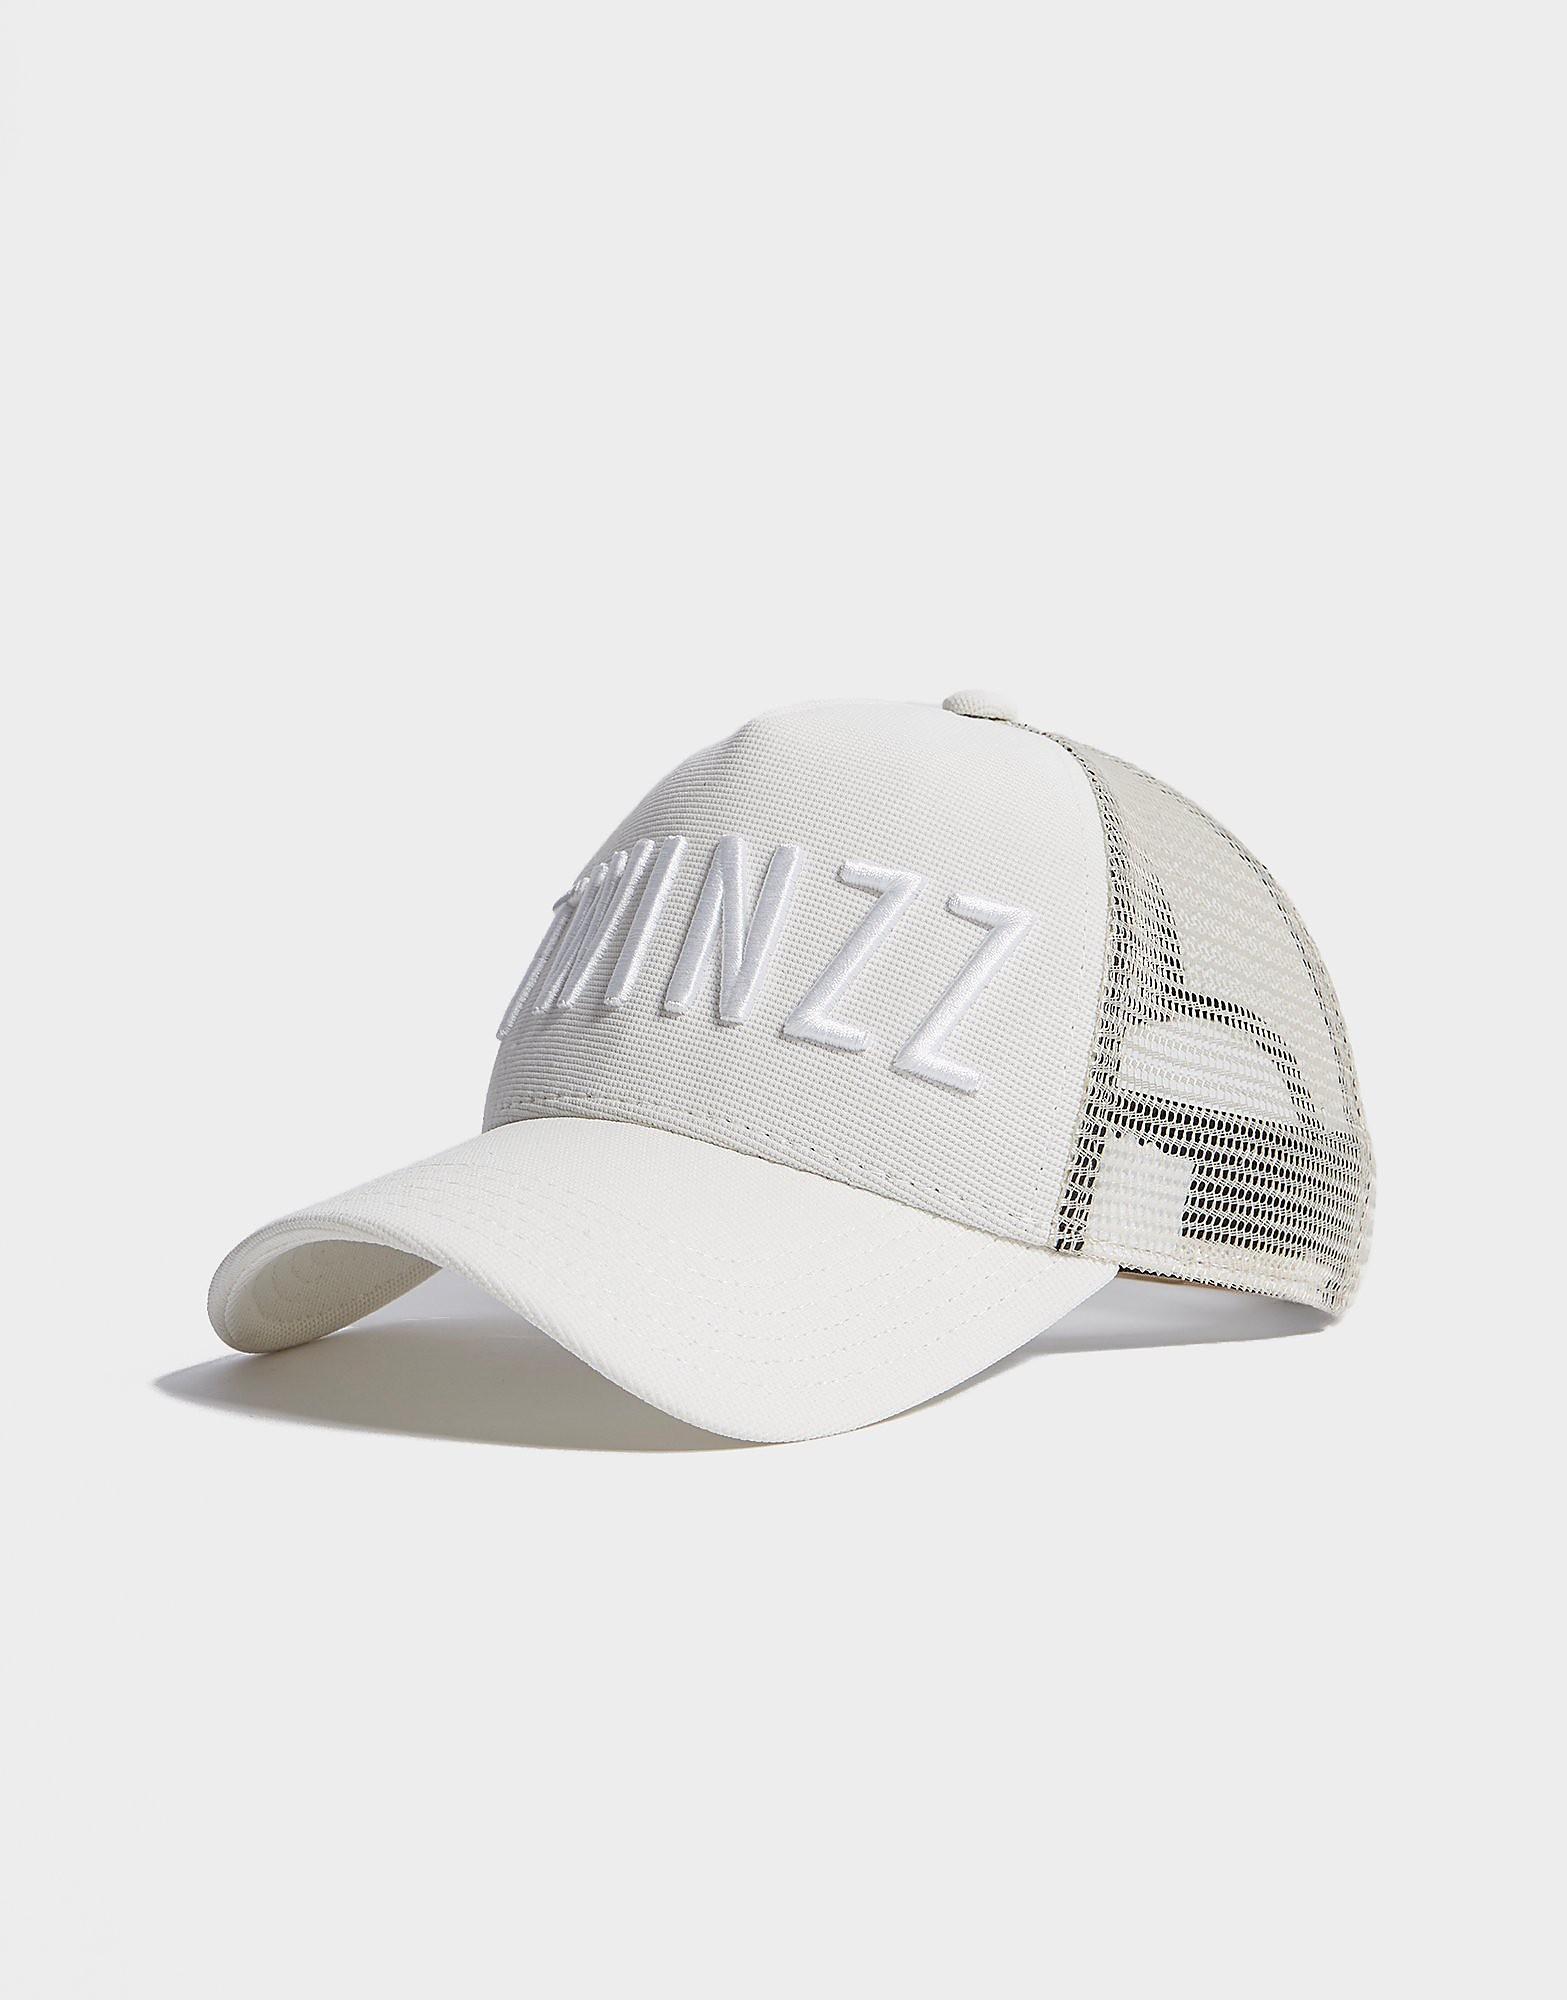 TWINZZ Trucker Cap